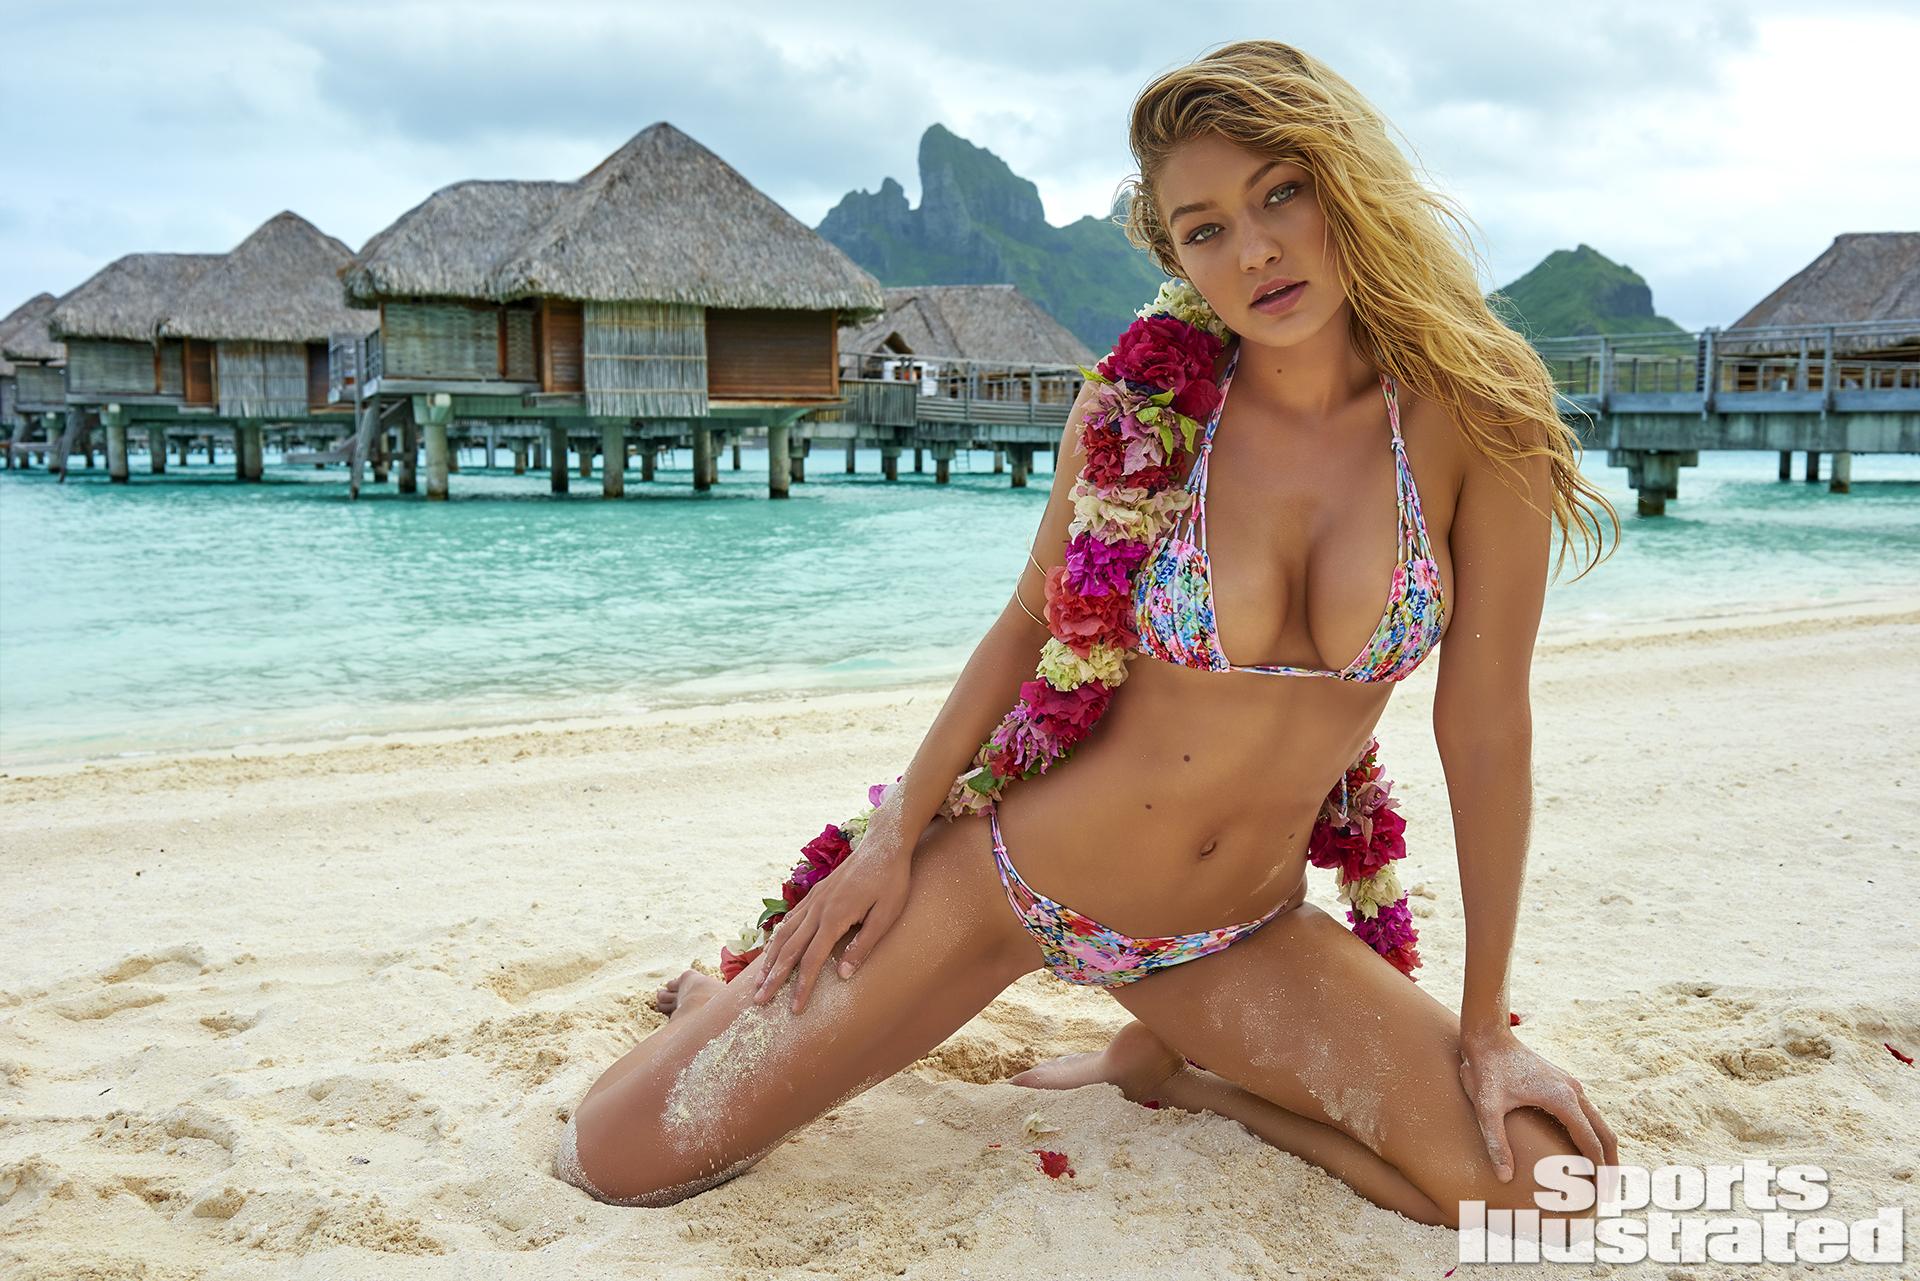 Gigi Hadid was photographed by Yu Tsai in The Islands Of Tahiti. Swimsuit by Kai Lani Swimwear.